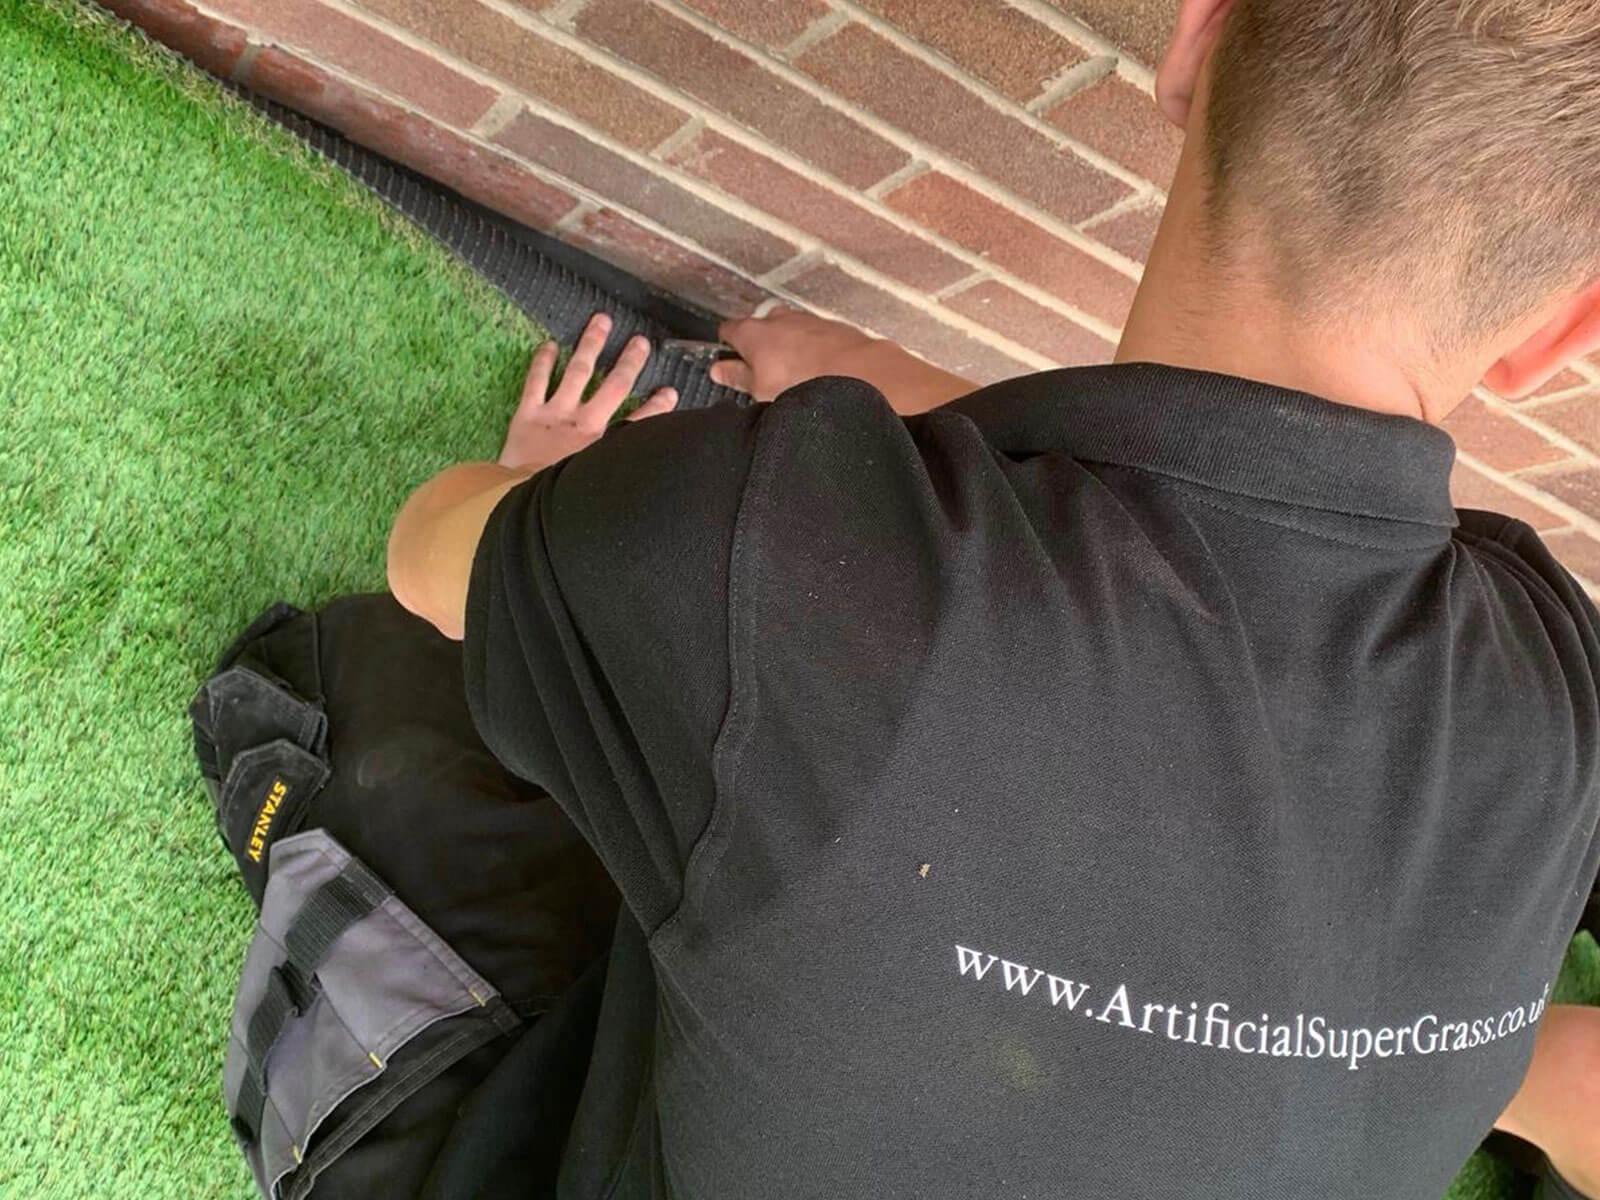 Artificial Grass Suppliers Scarborough Artificial Super Grass